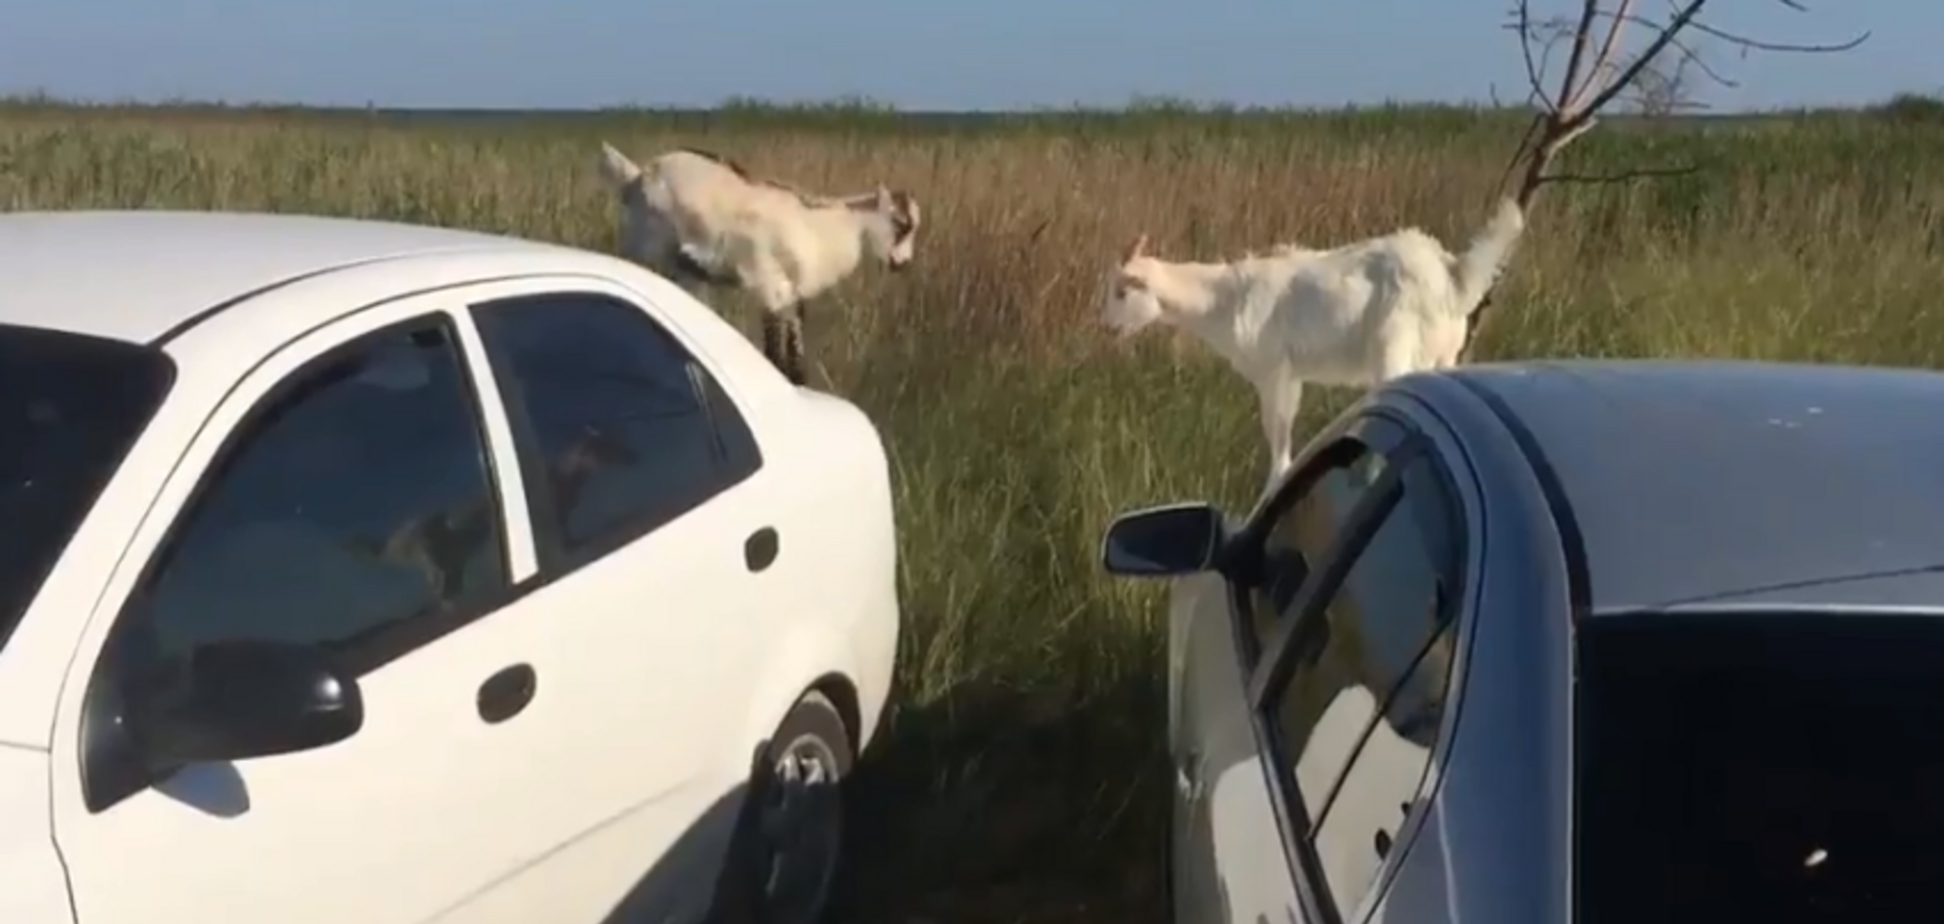 На запорожском курорте козлы прыгали по авто: момент сняли на видео